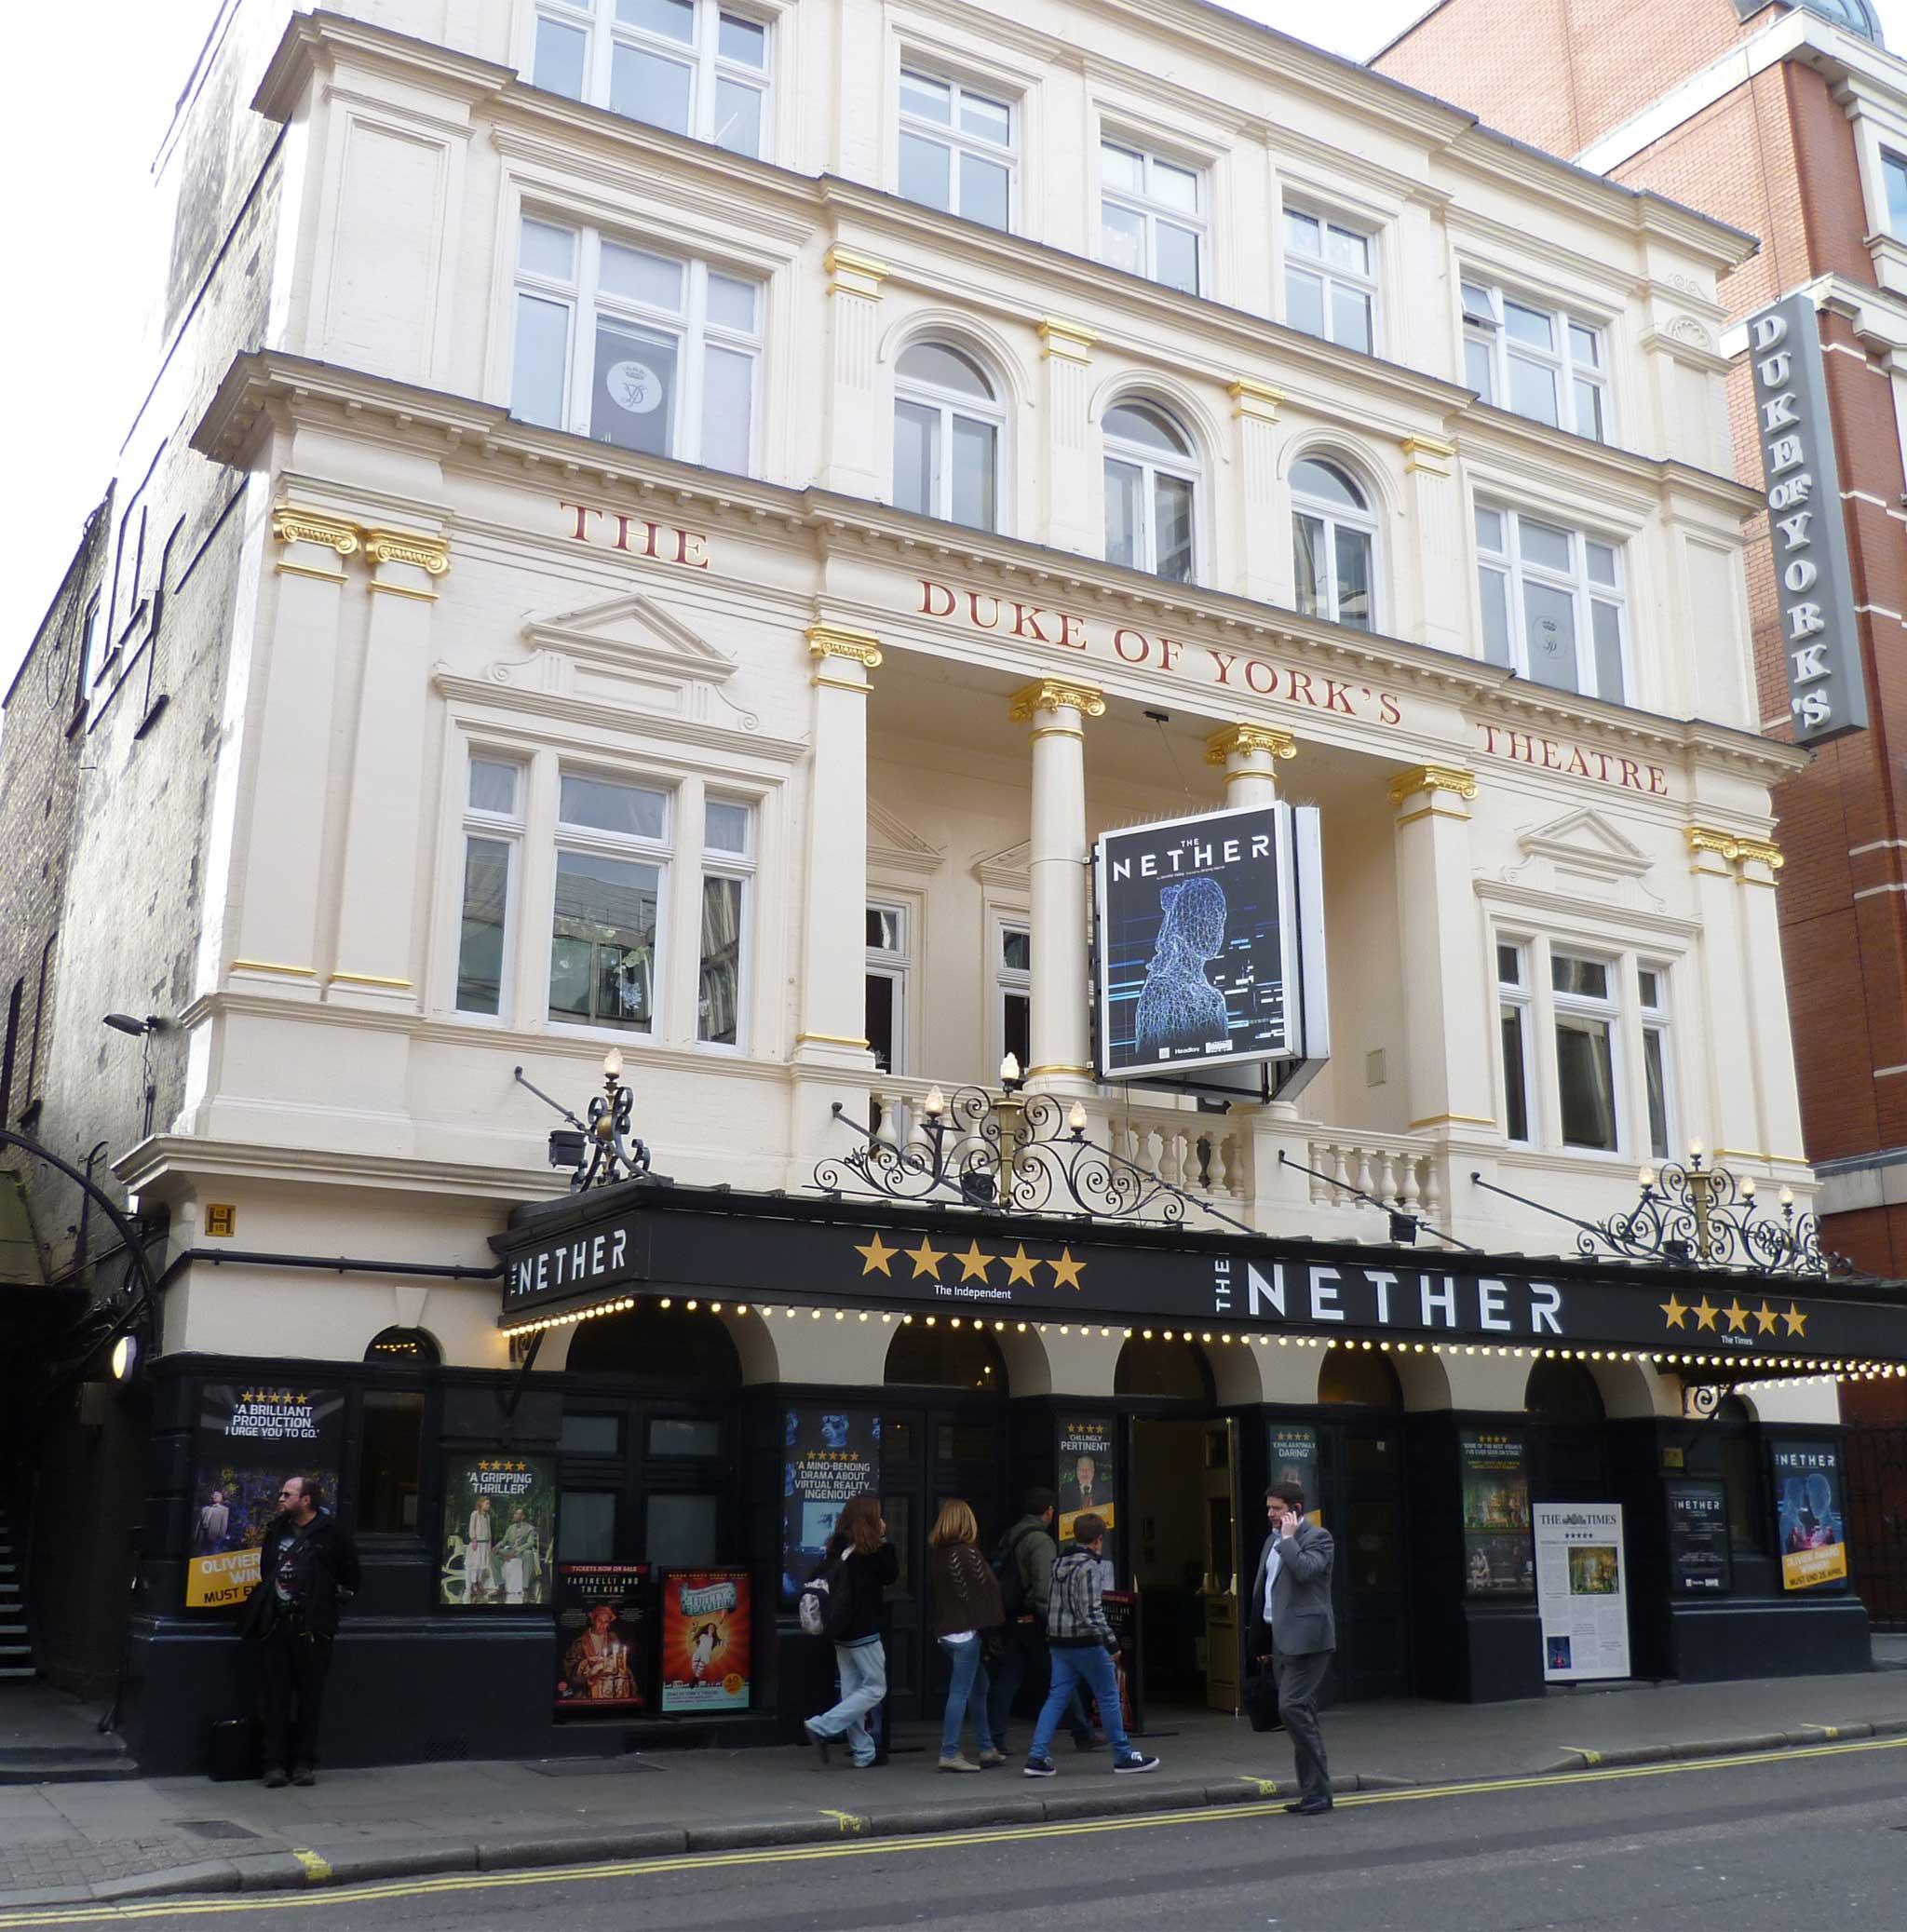 Duke of York's Theatre on London audio tour Theatreland Tour with Ian McKellen